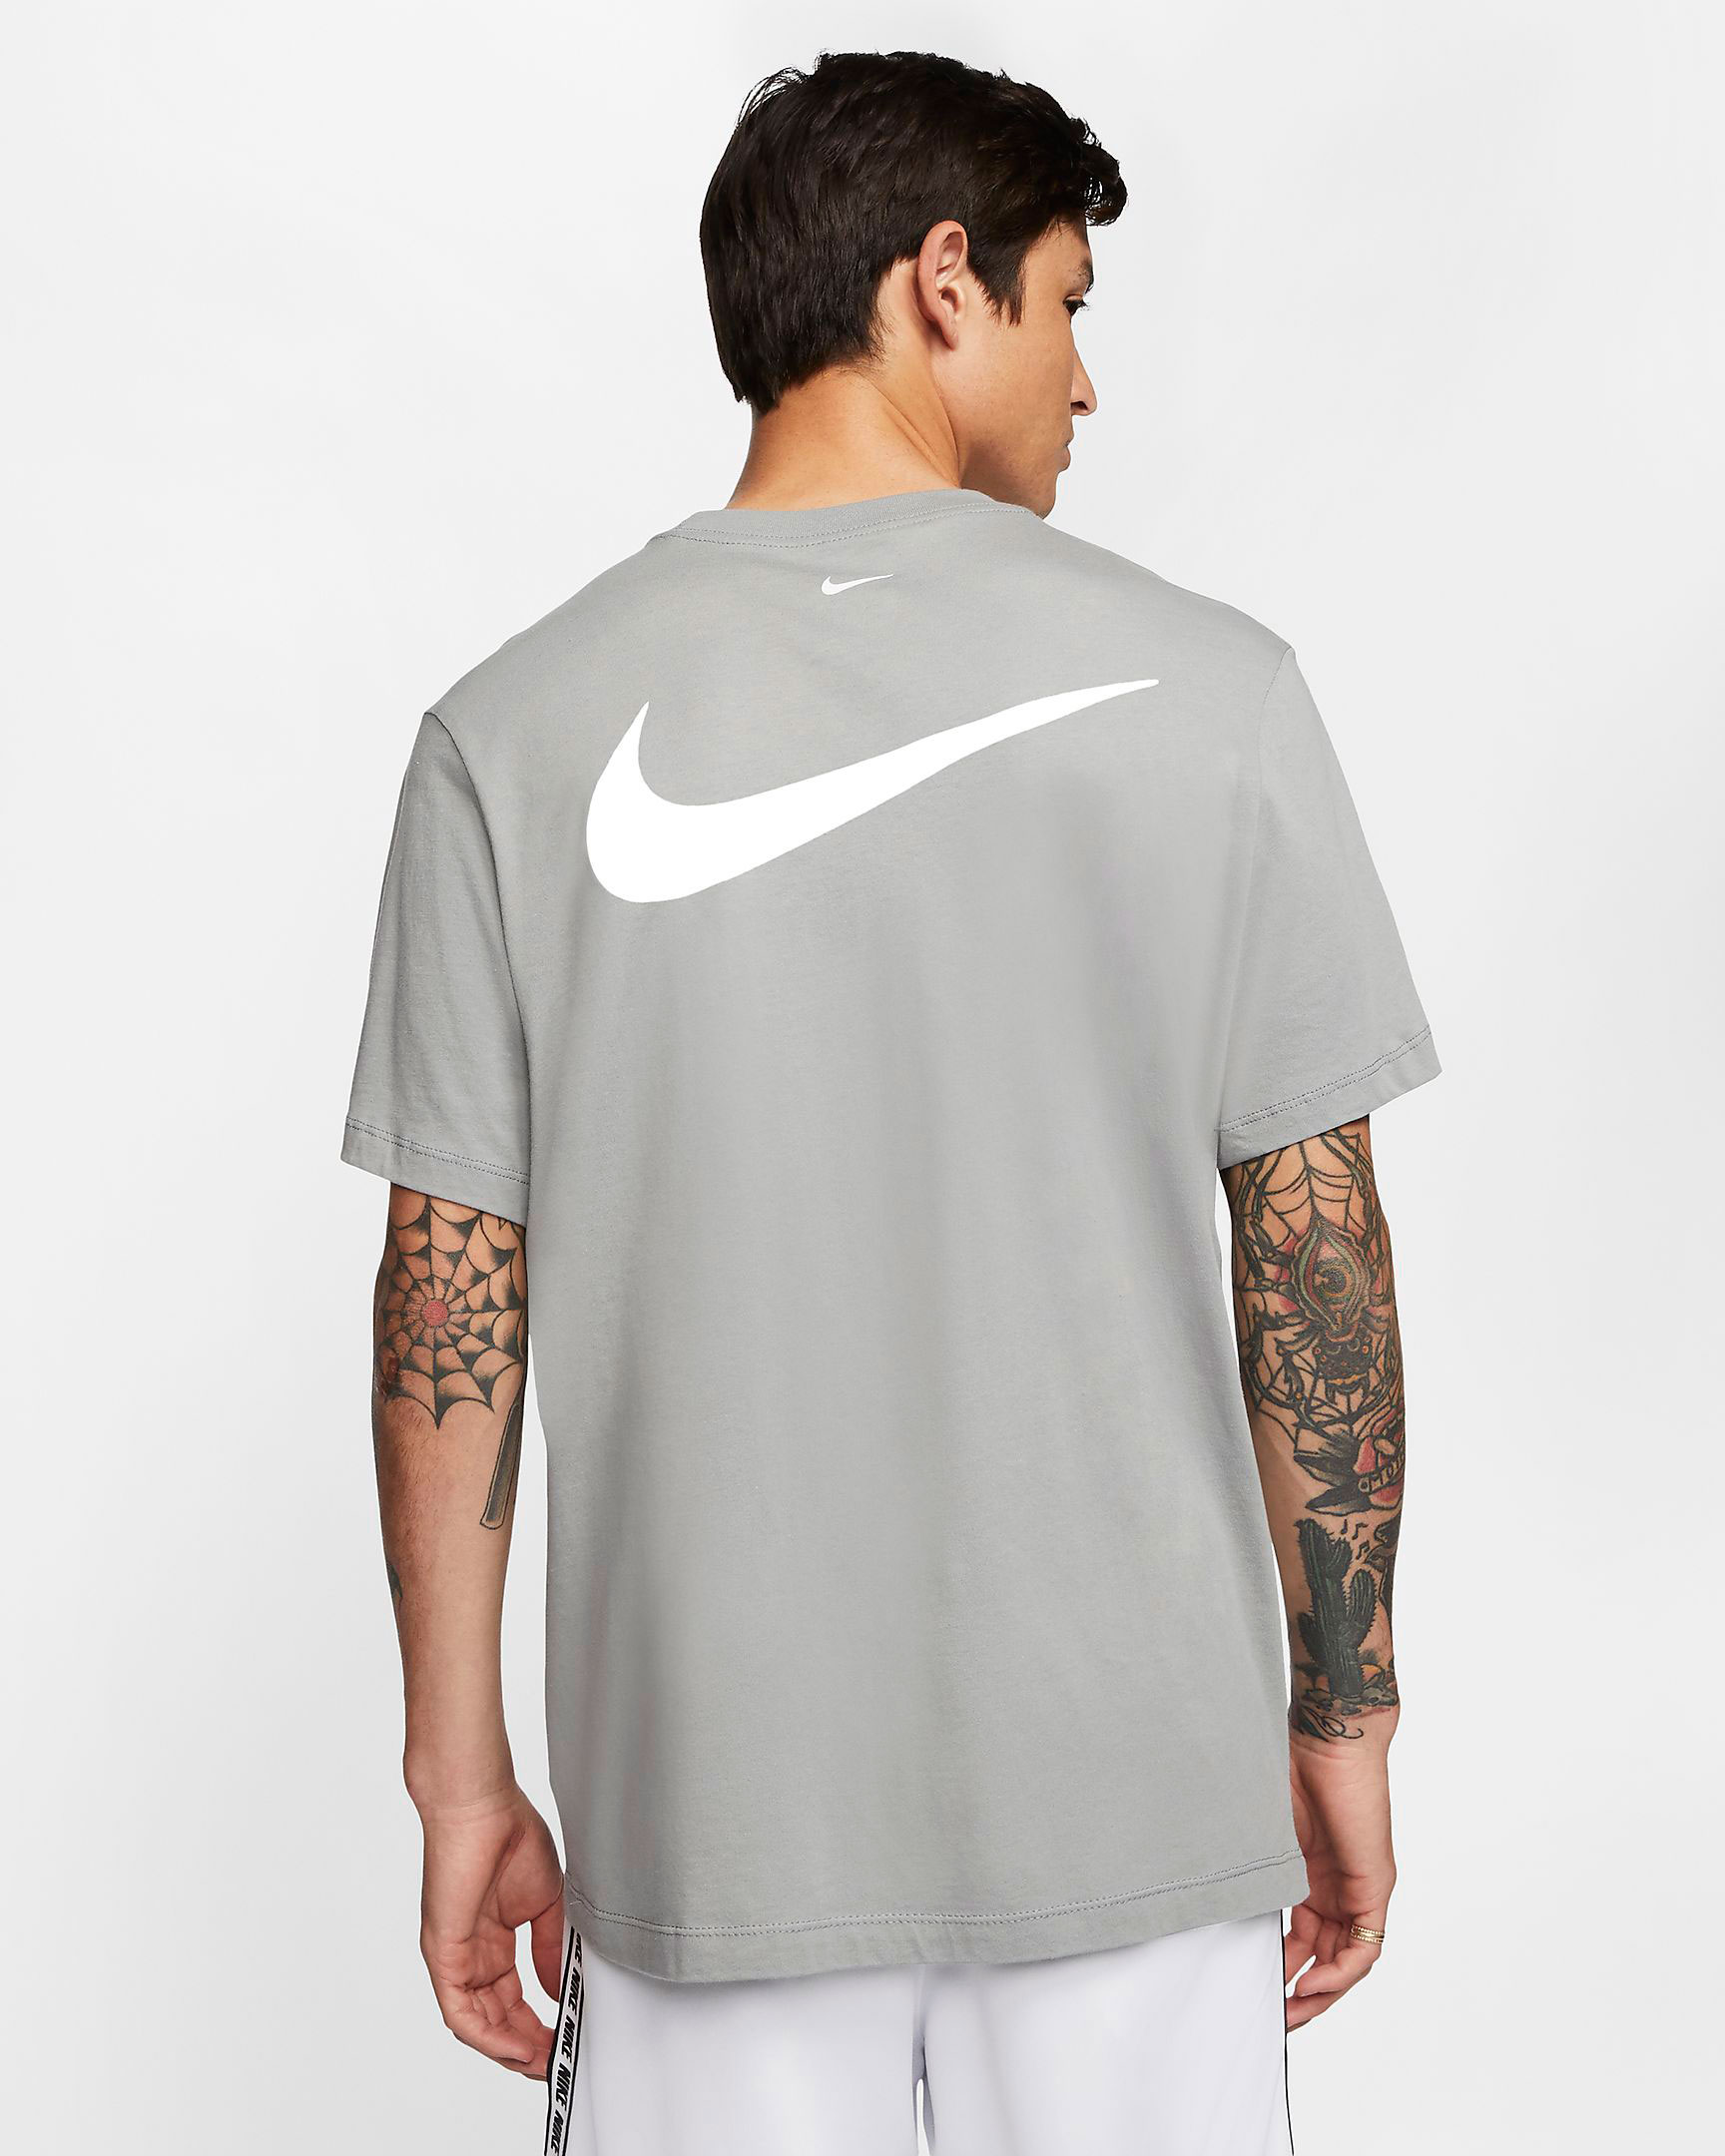 jordan-13-flint-grey-nike-shirt-match-2